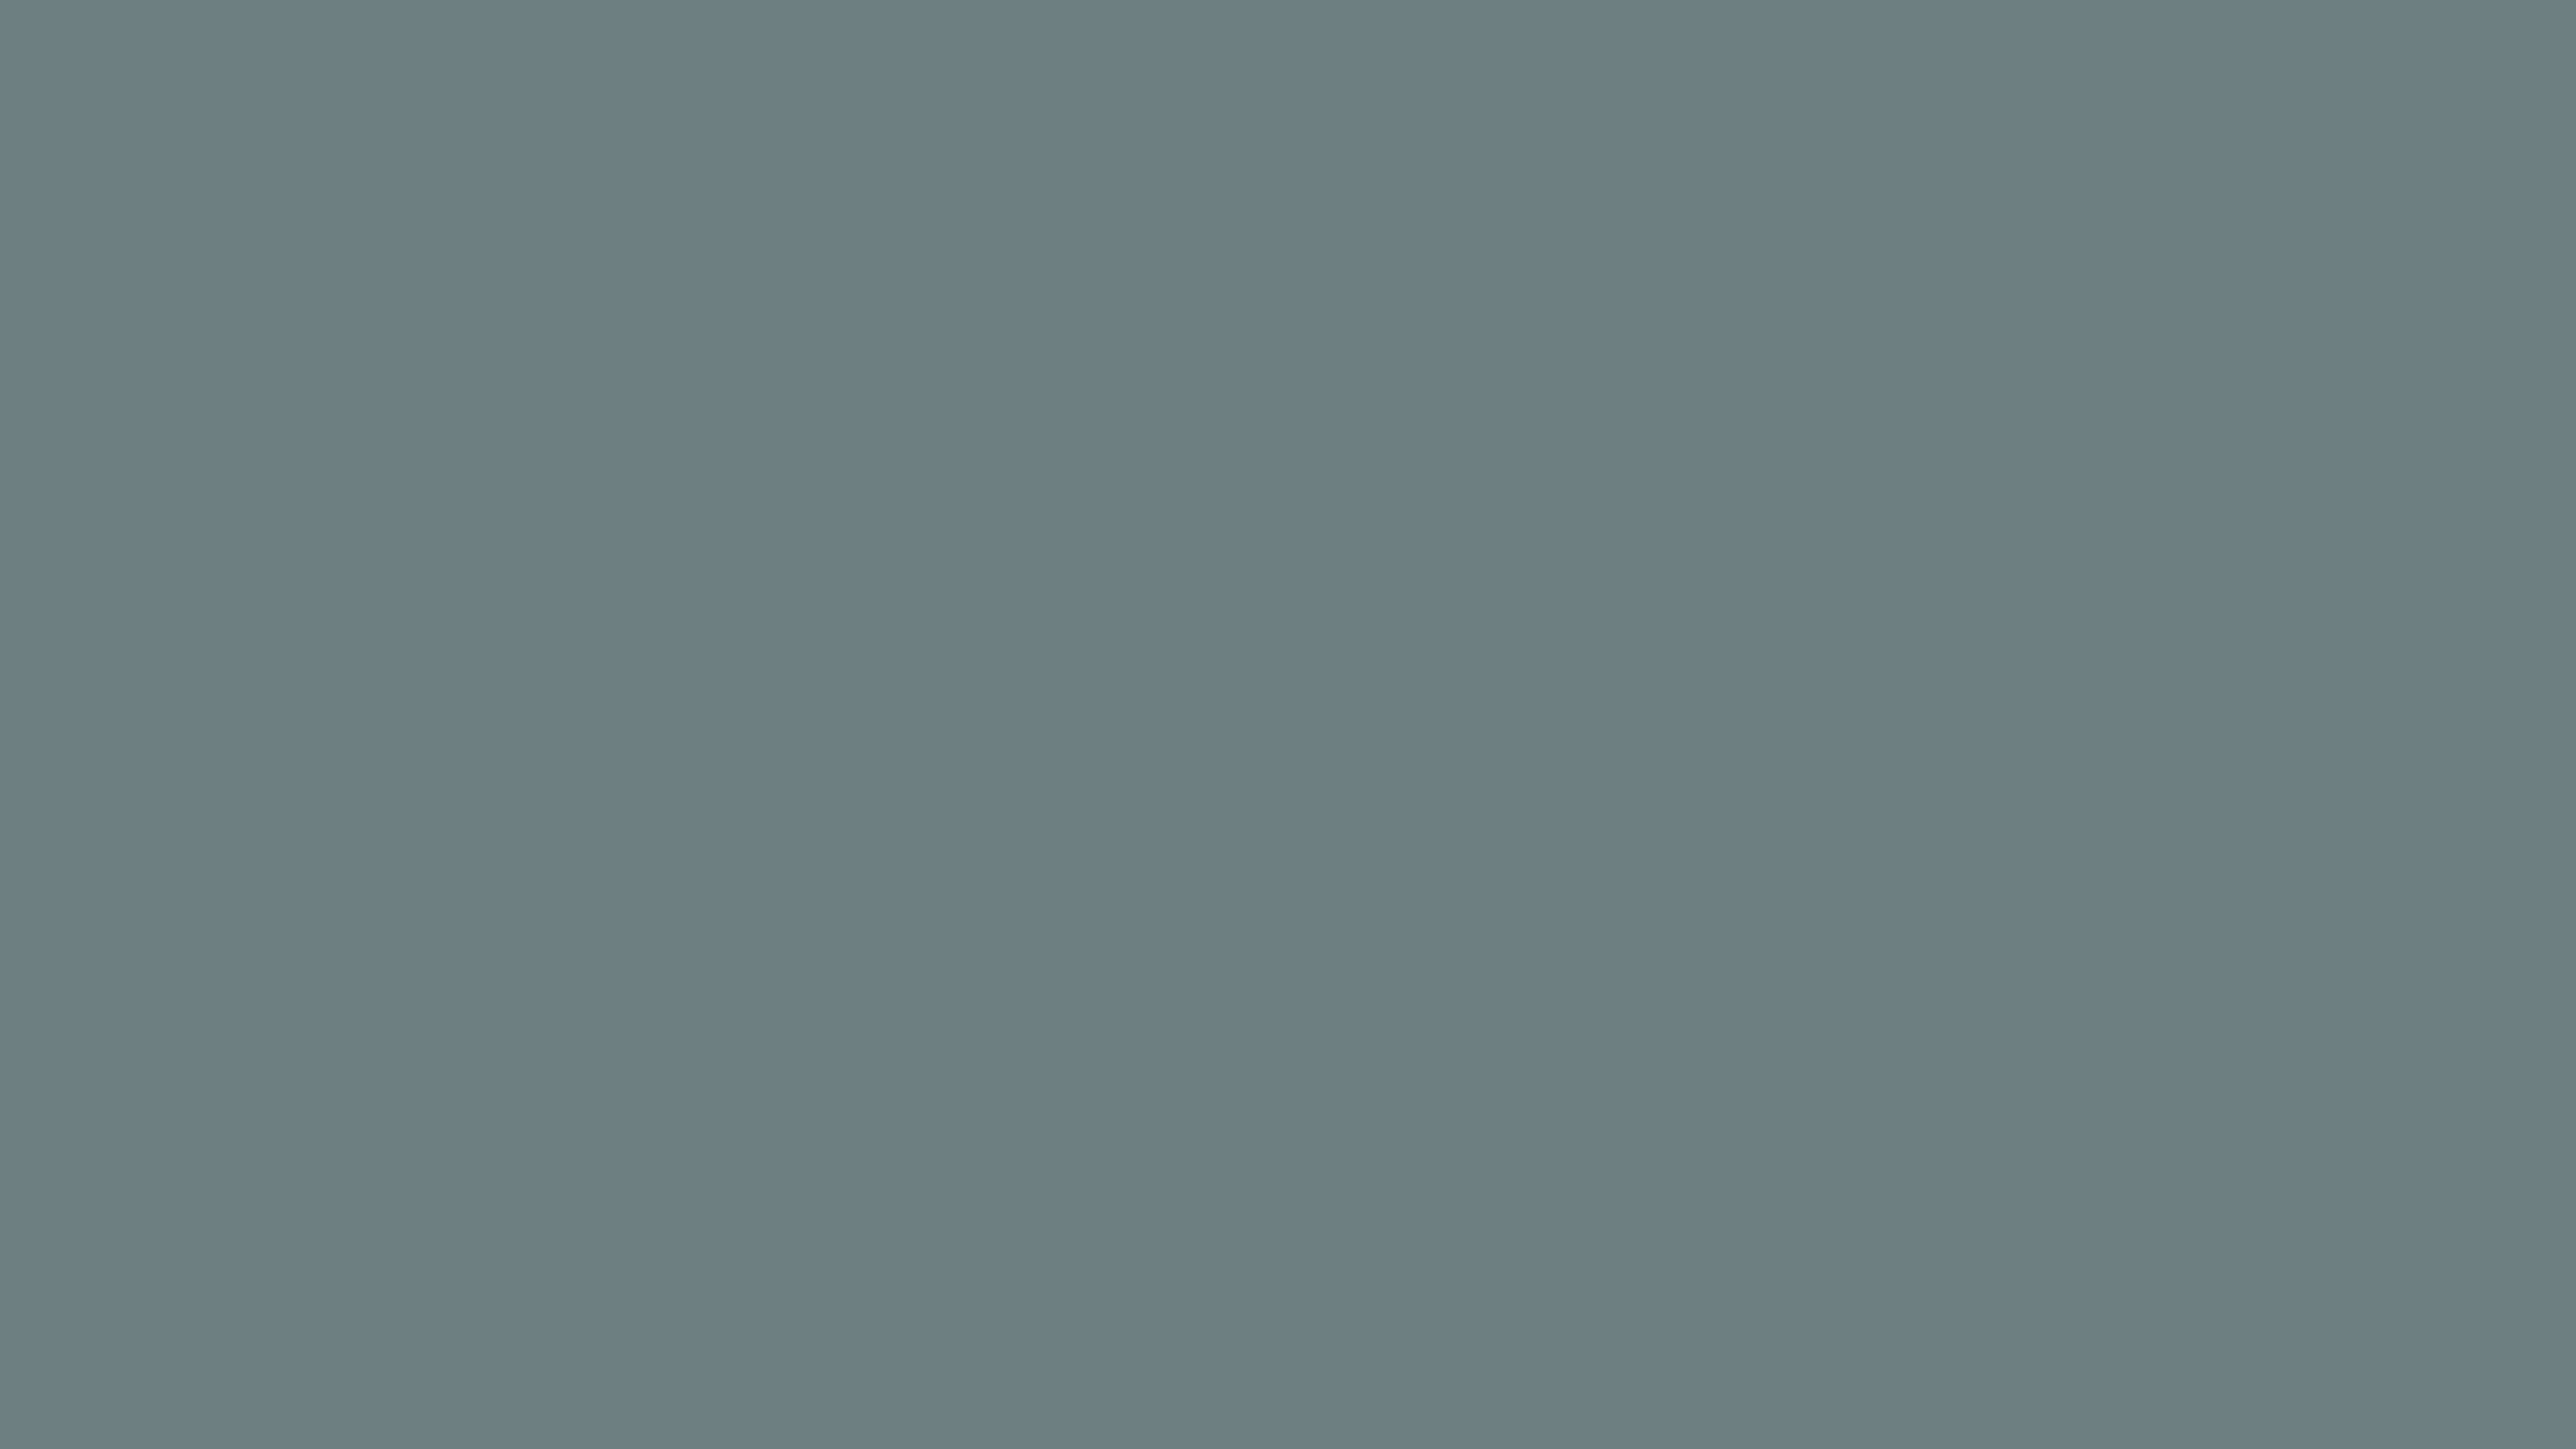 3840x2160 AuroMetalSaurus Solid Color Background